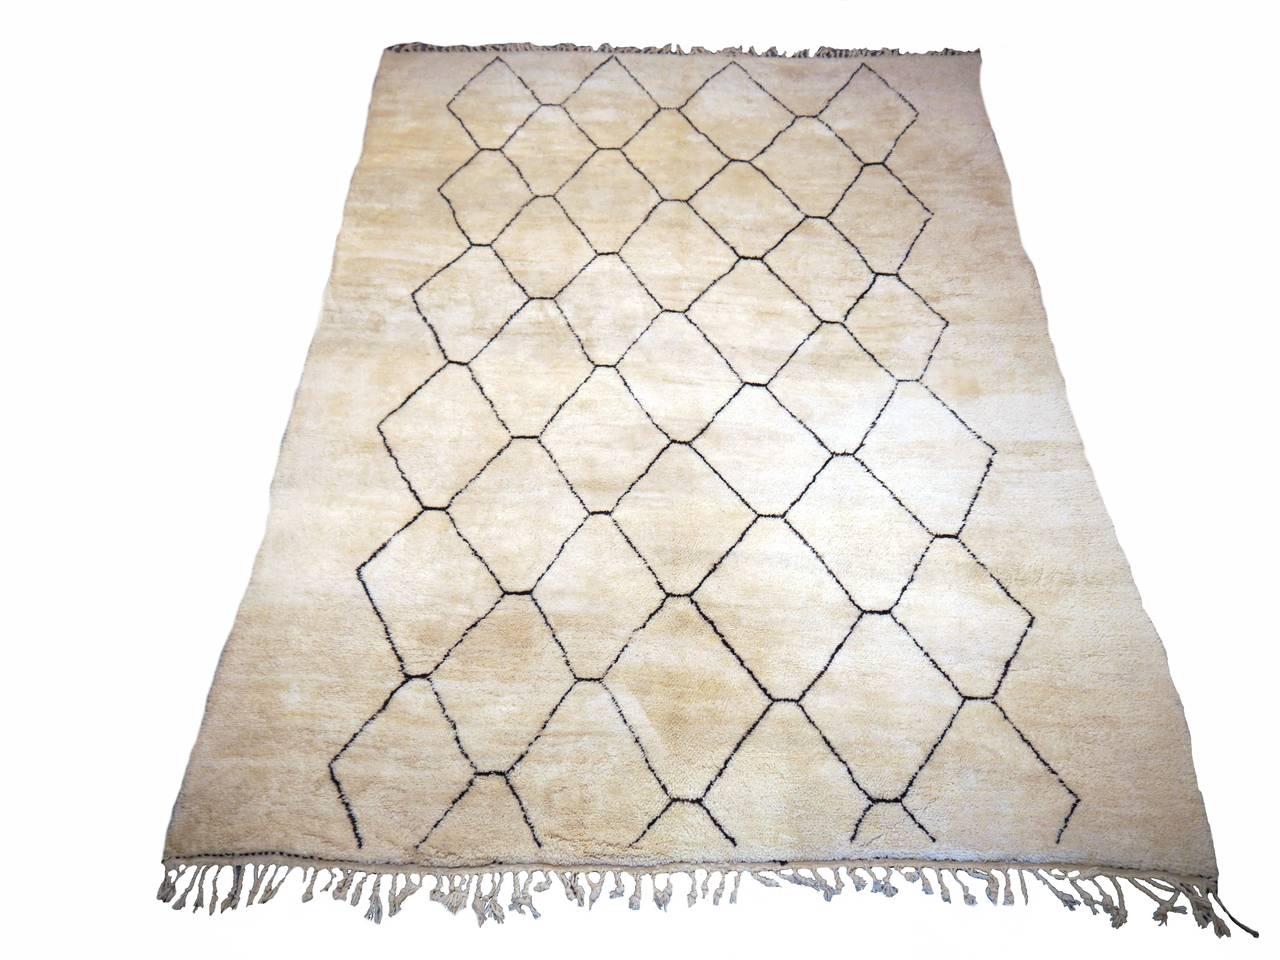 beni ourain diamond design berber rug at 1stdibs. Black Bedroom Furniture Sets. Home Design Ideas